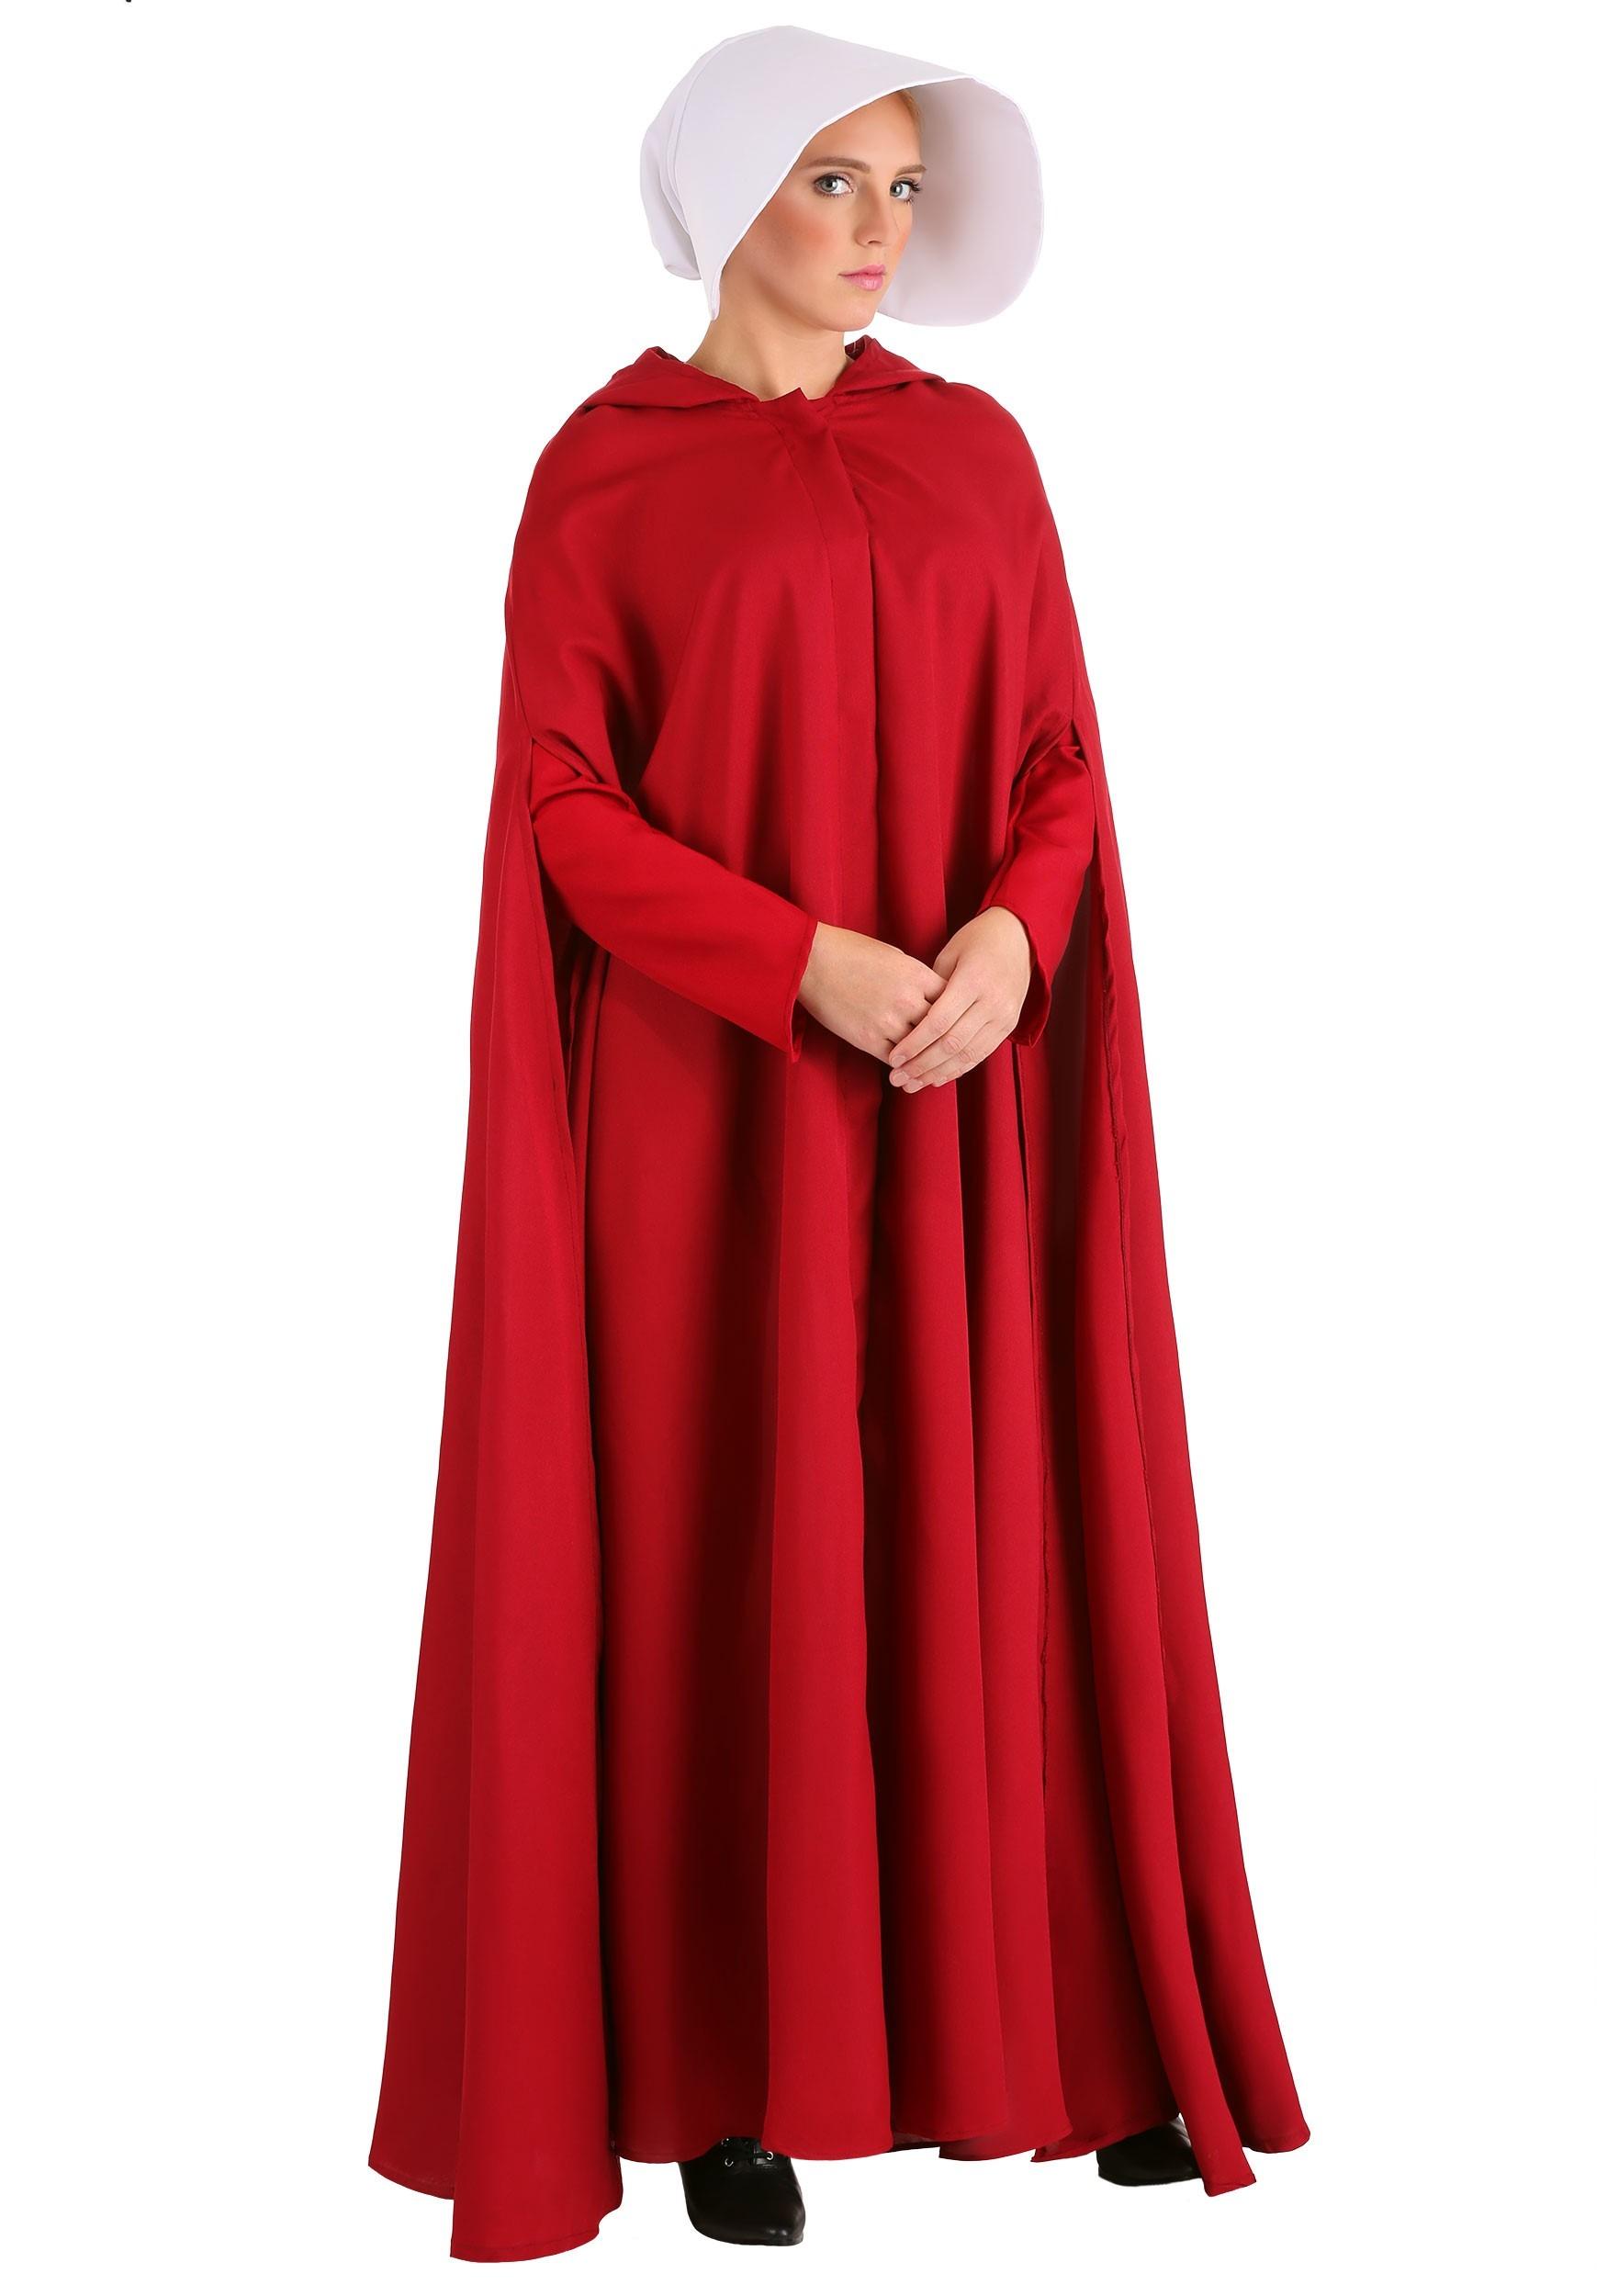 Handmaid's Tale Costume for Women | Movie Character Costume